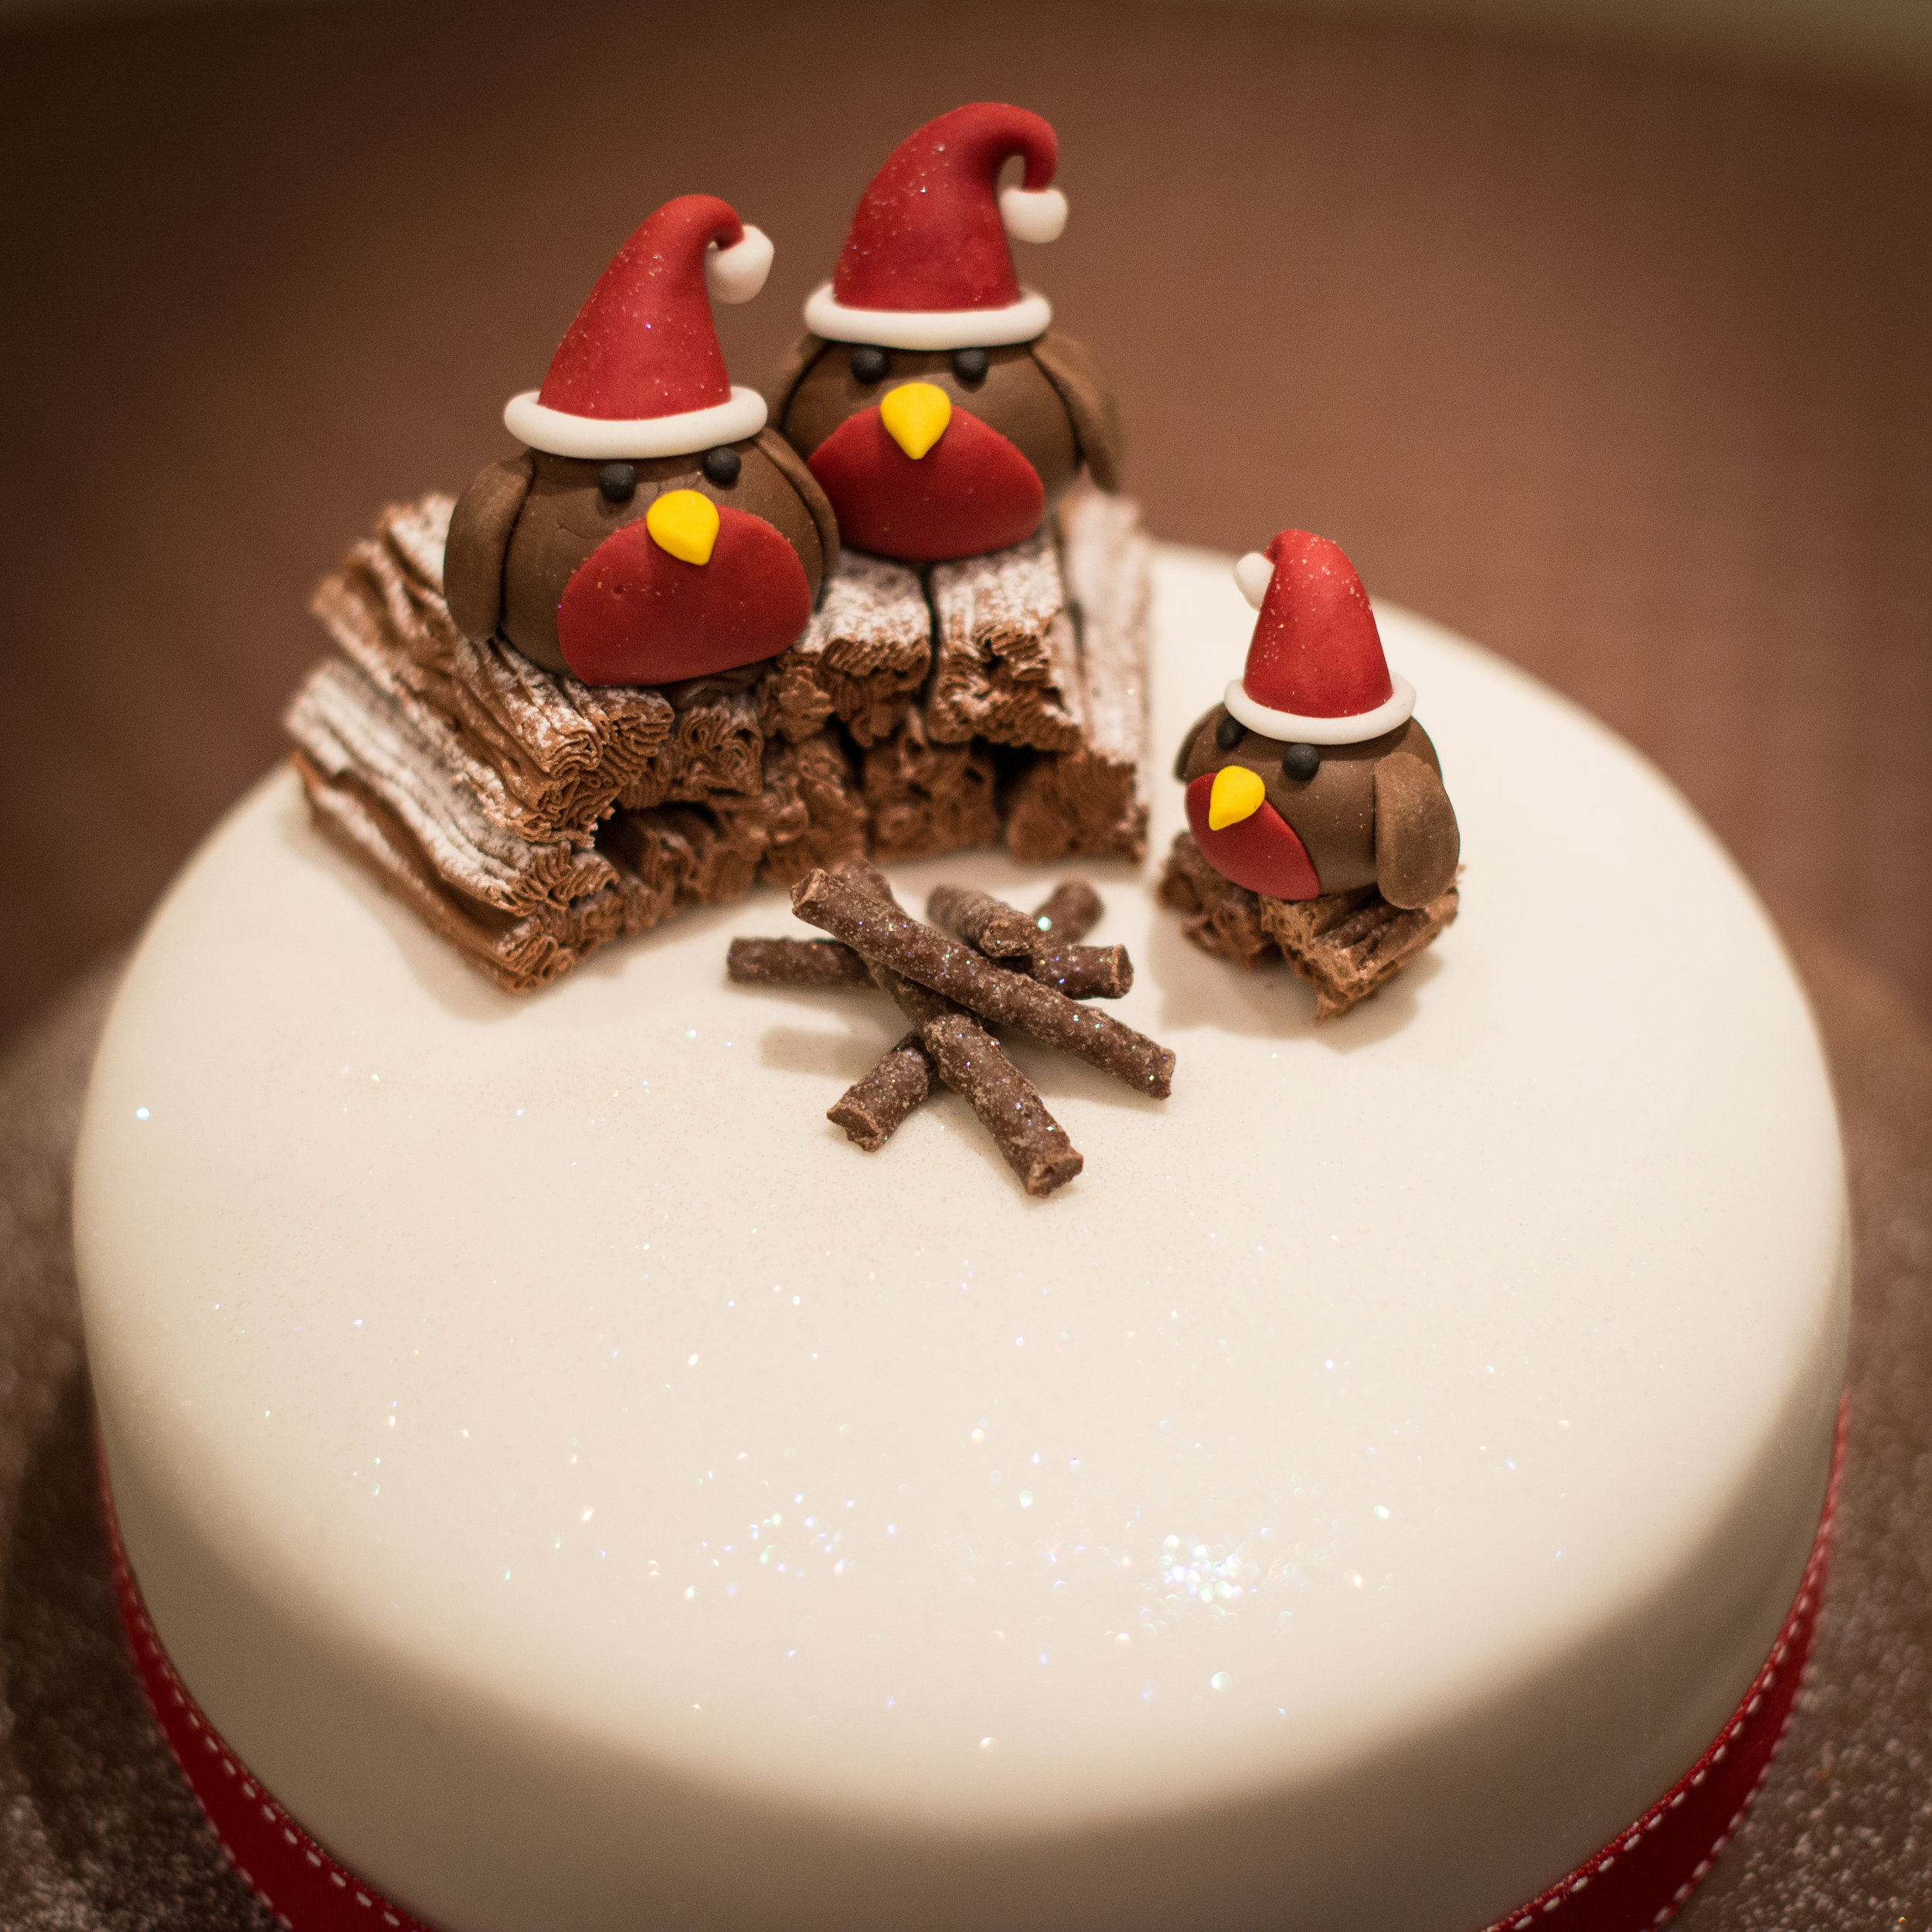 Three Chocolate Robins on a Christmas Fruitcake